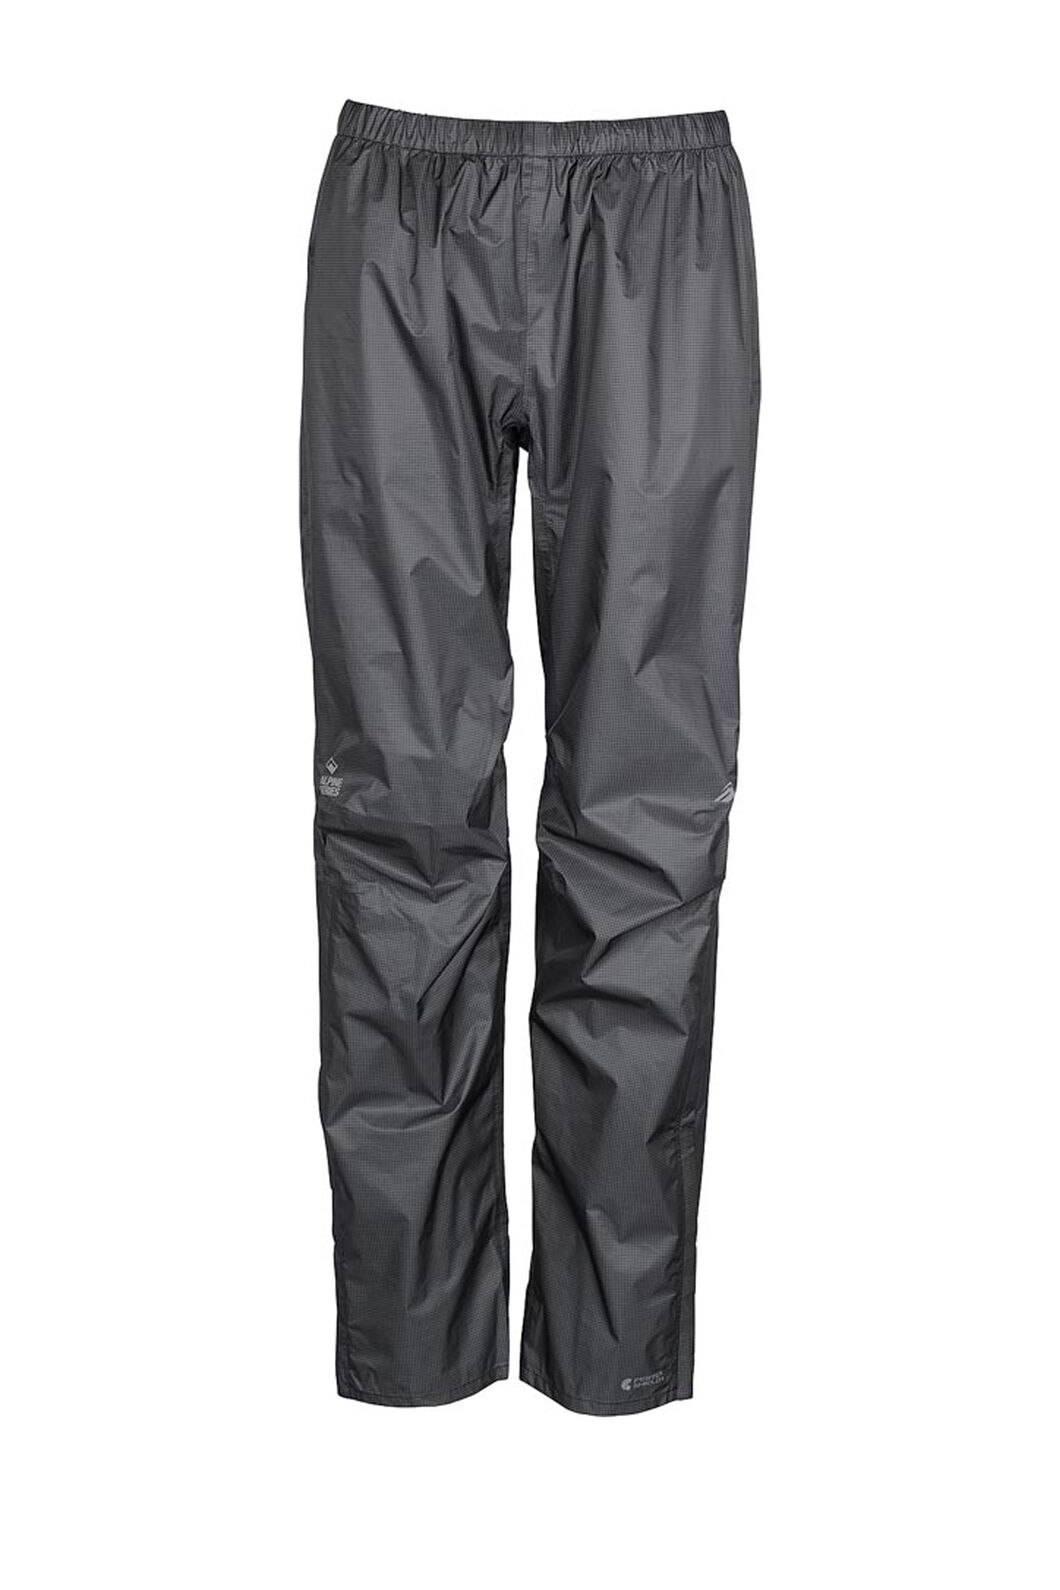 Macpac Hightail Pertex® Rain Pants — Women's, Black, hi-res